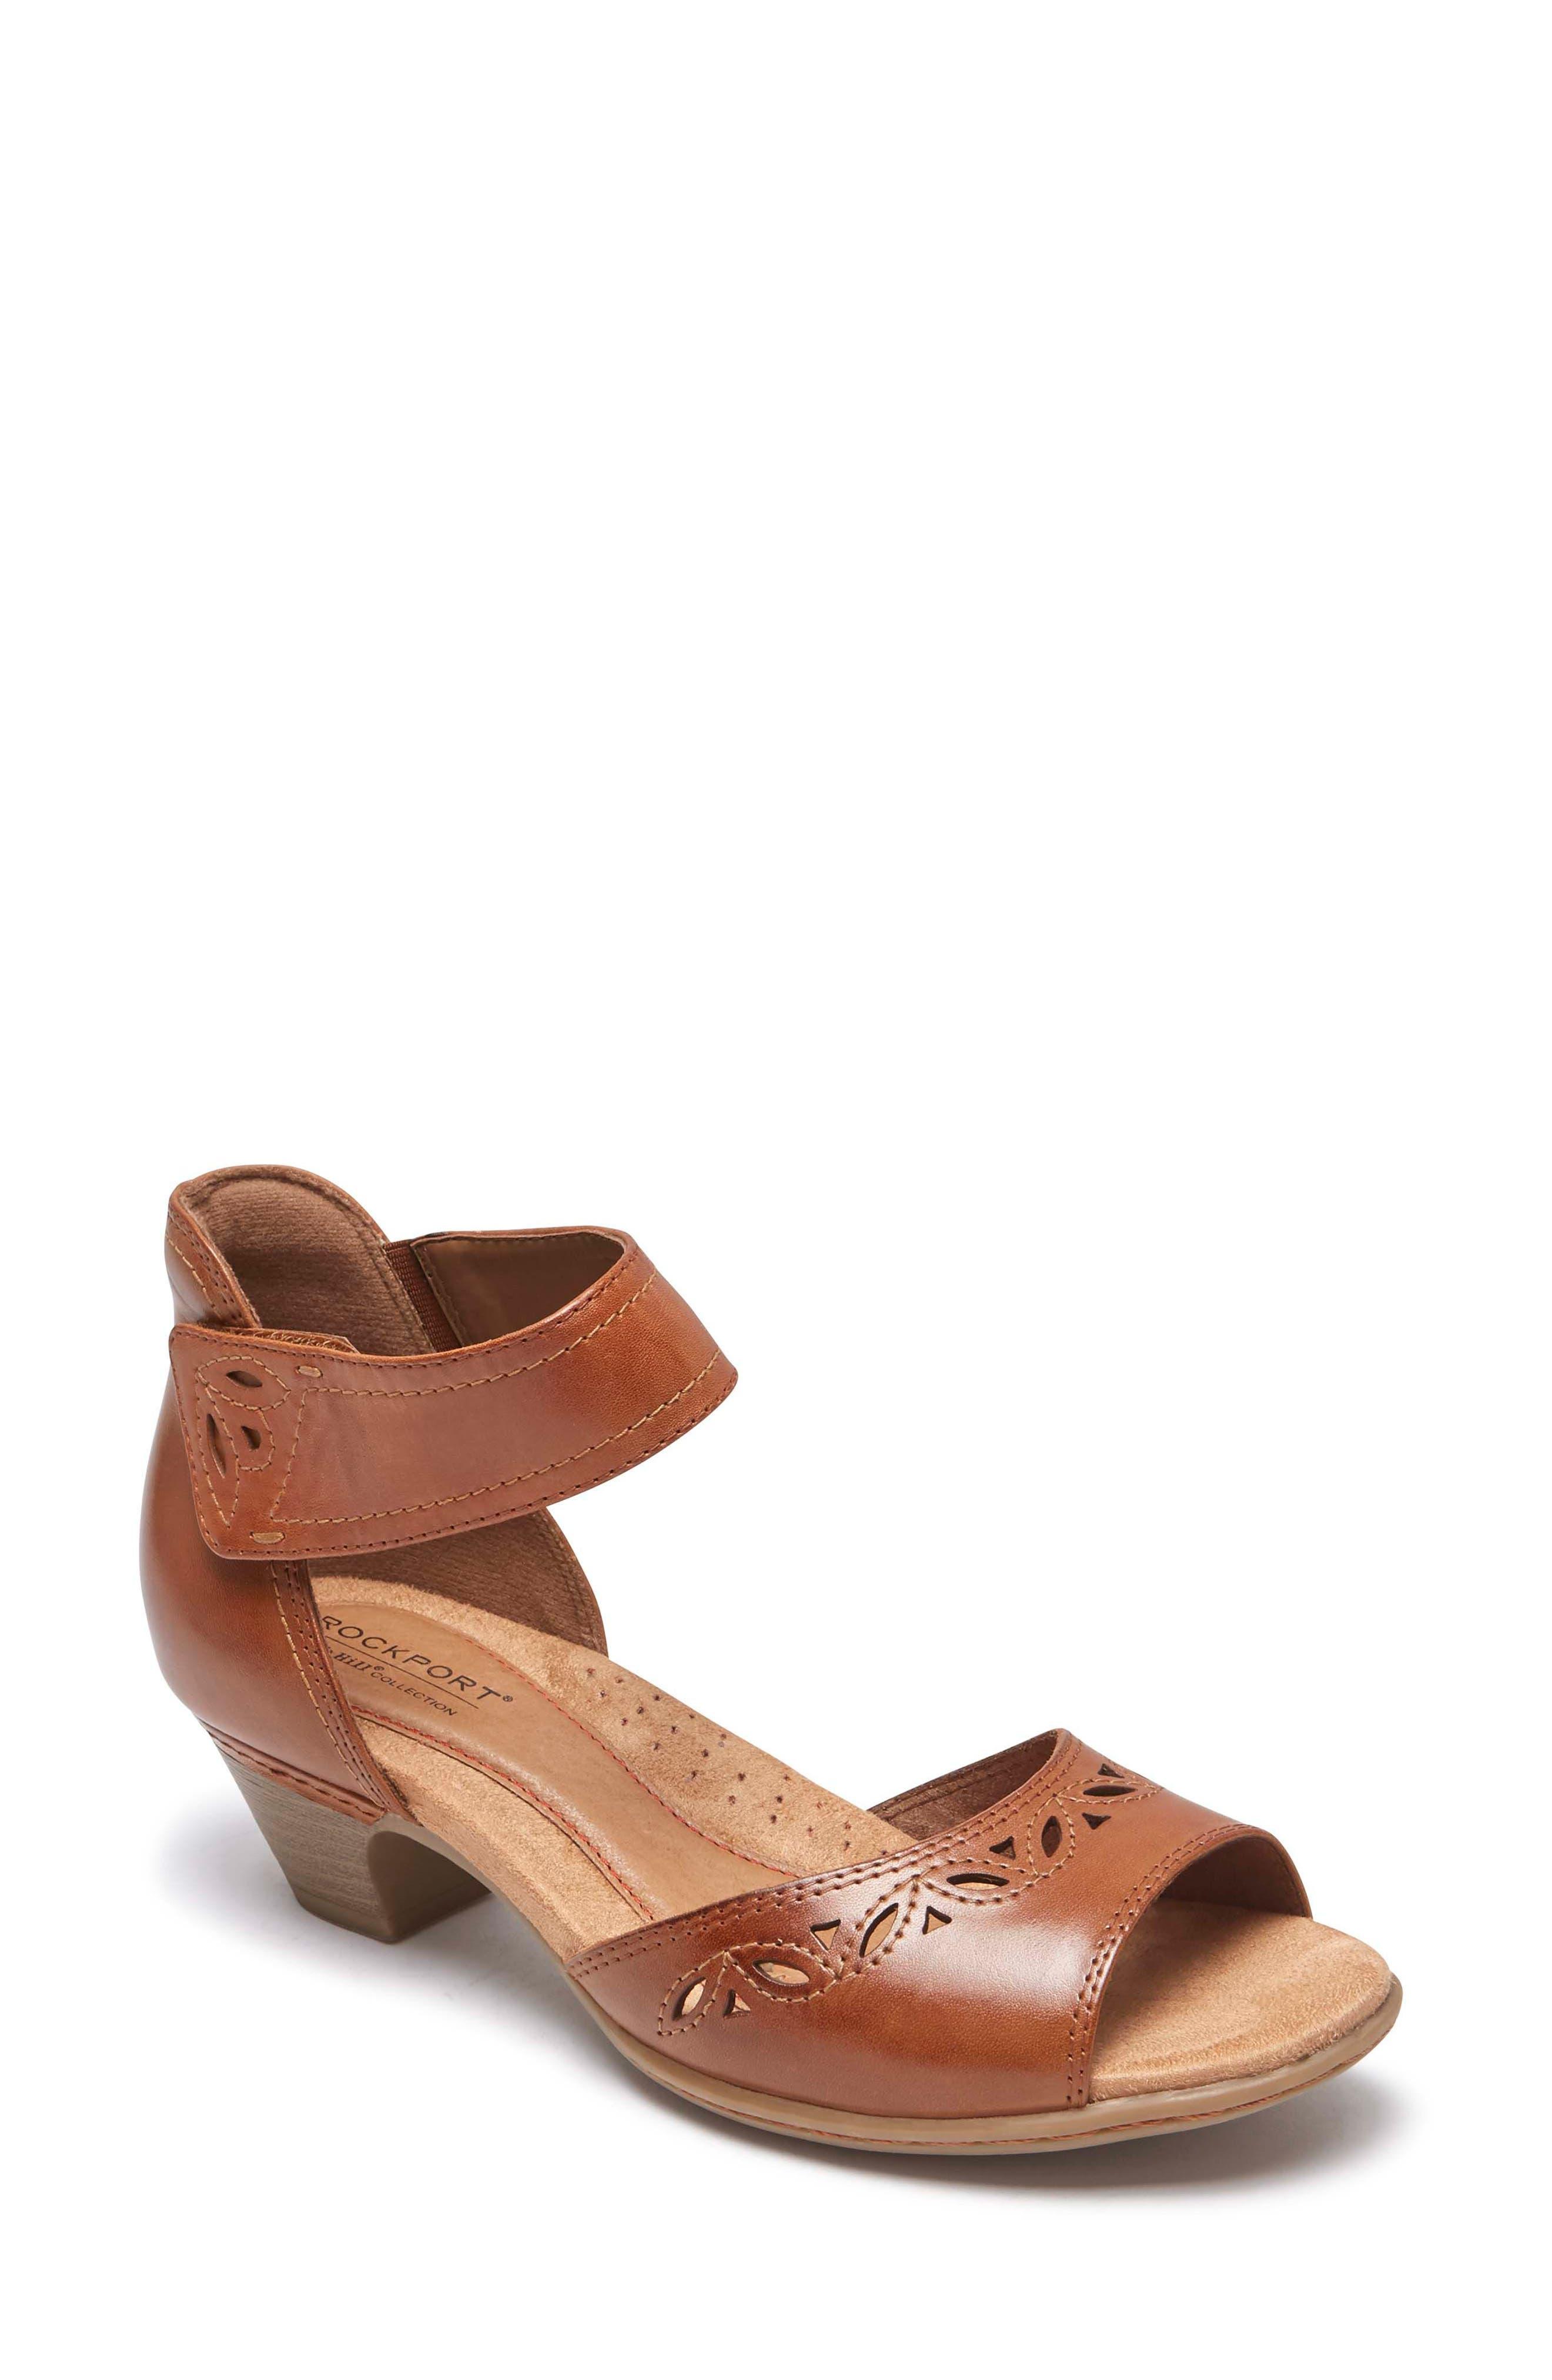 Rockport Women's Abbott Perforated Sandal 2gSa1S0vy